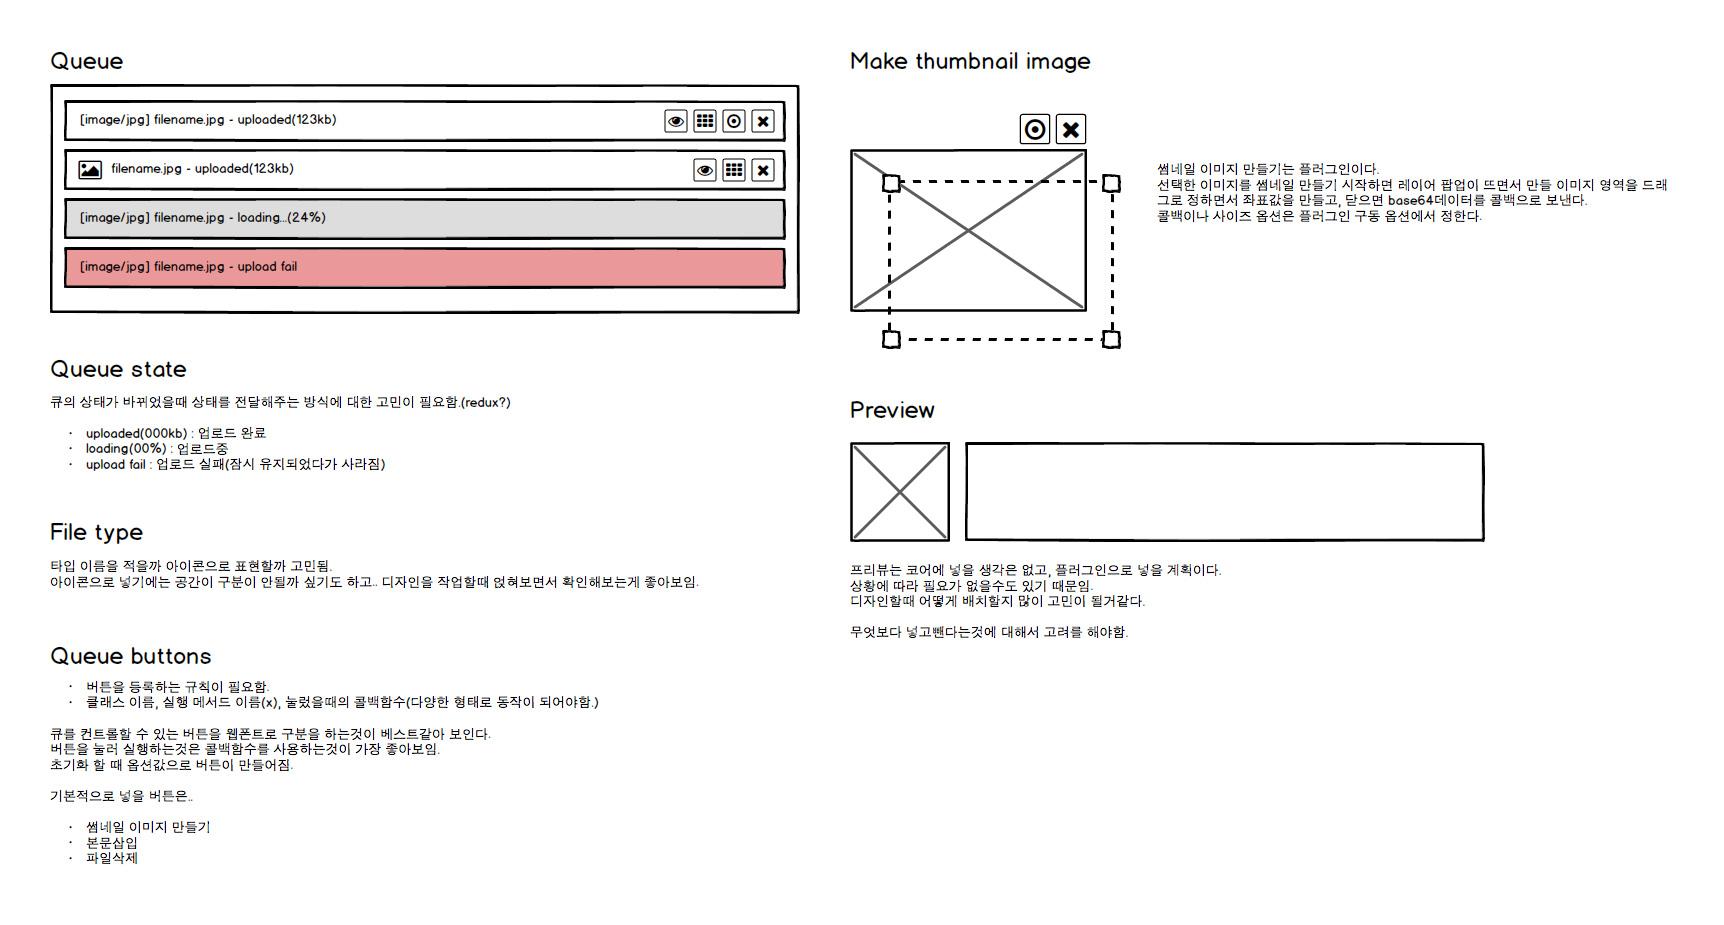 rg-uploader-002.jpg